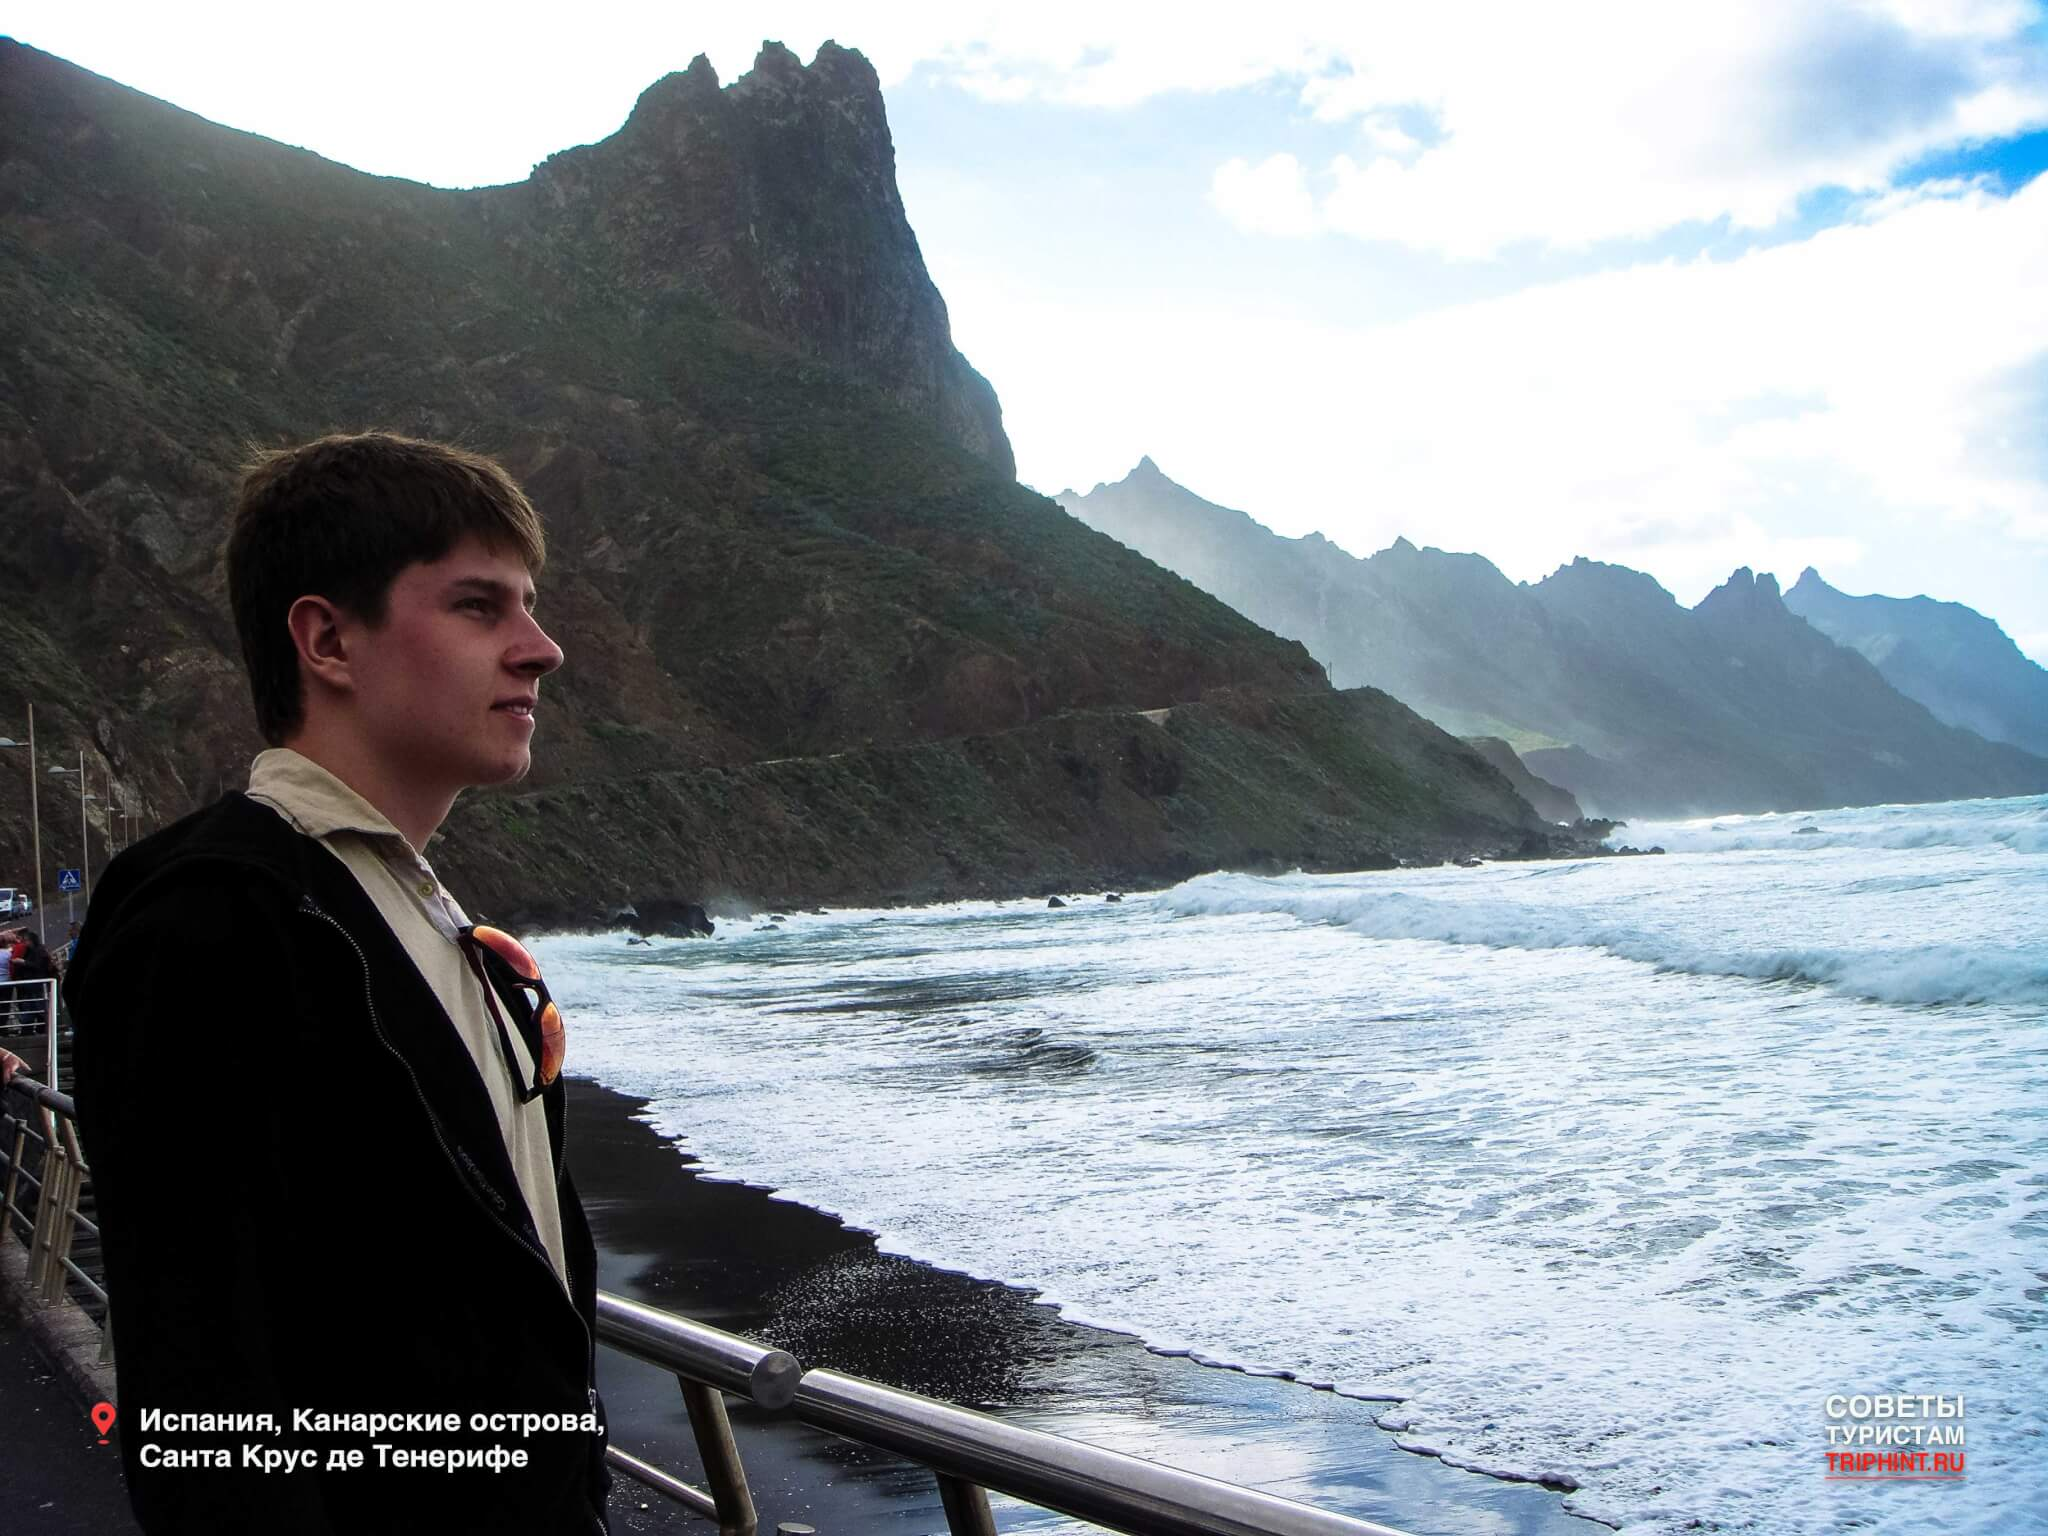 Достопримечательности Испании. Канарские острова, Санта Крус де Тенерифе